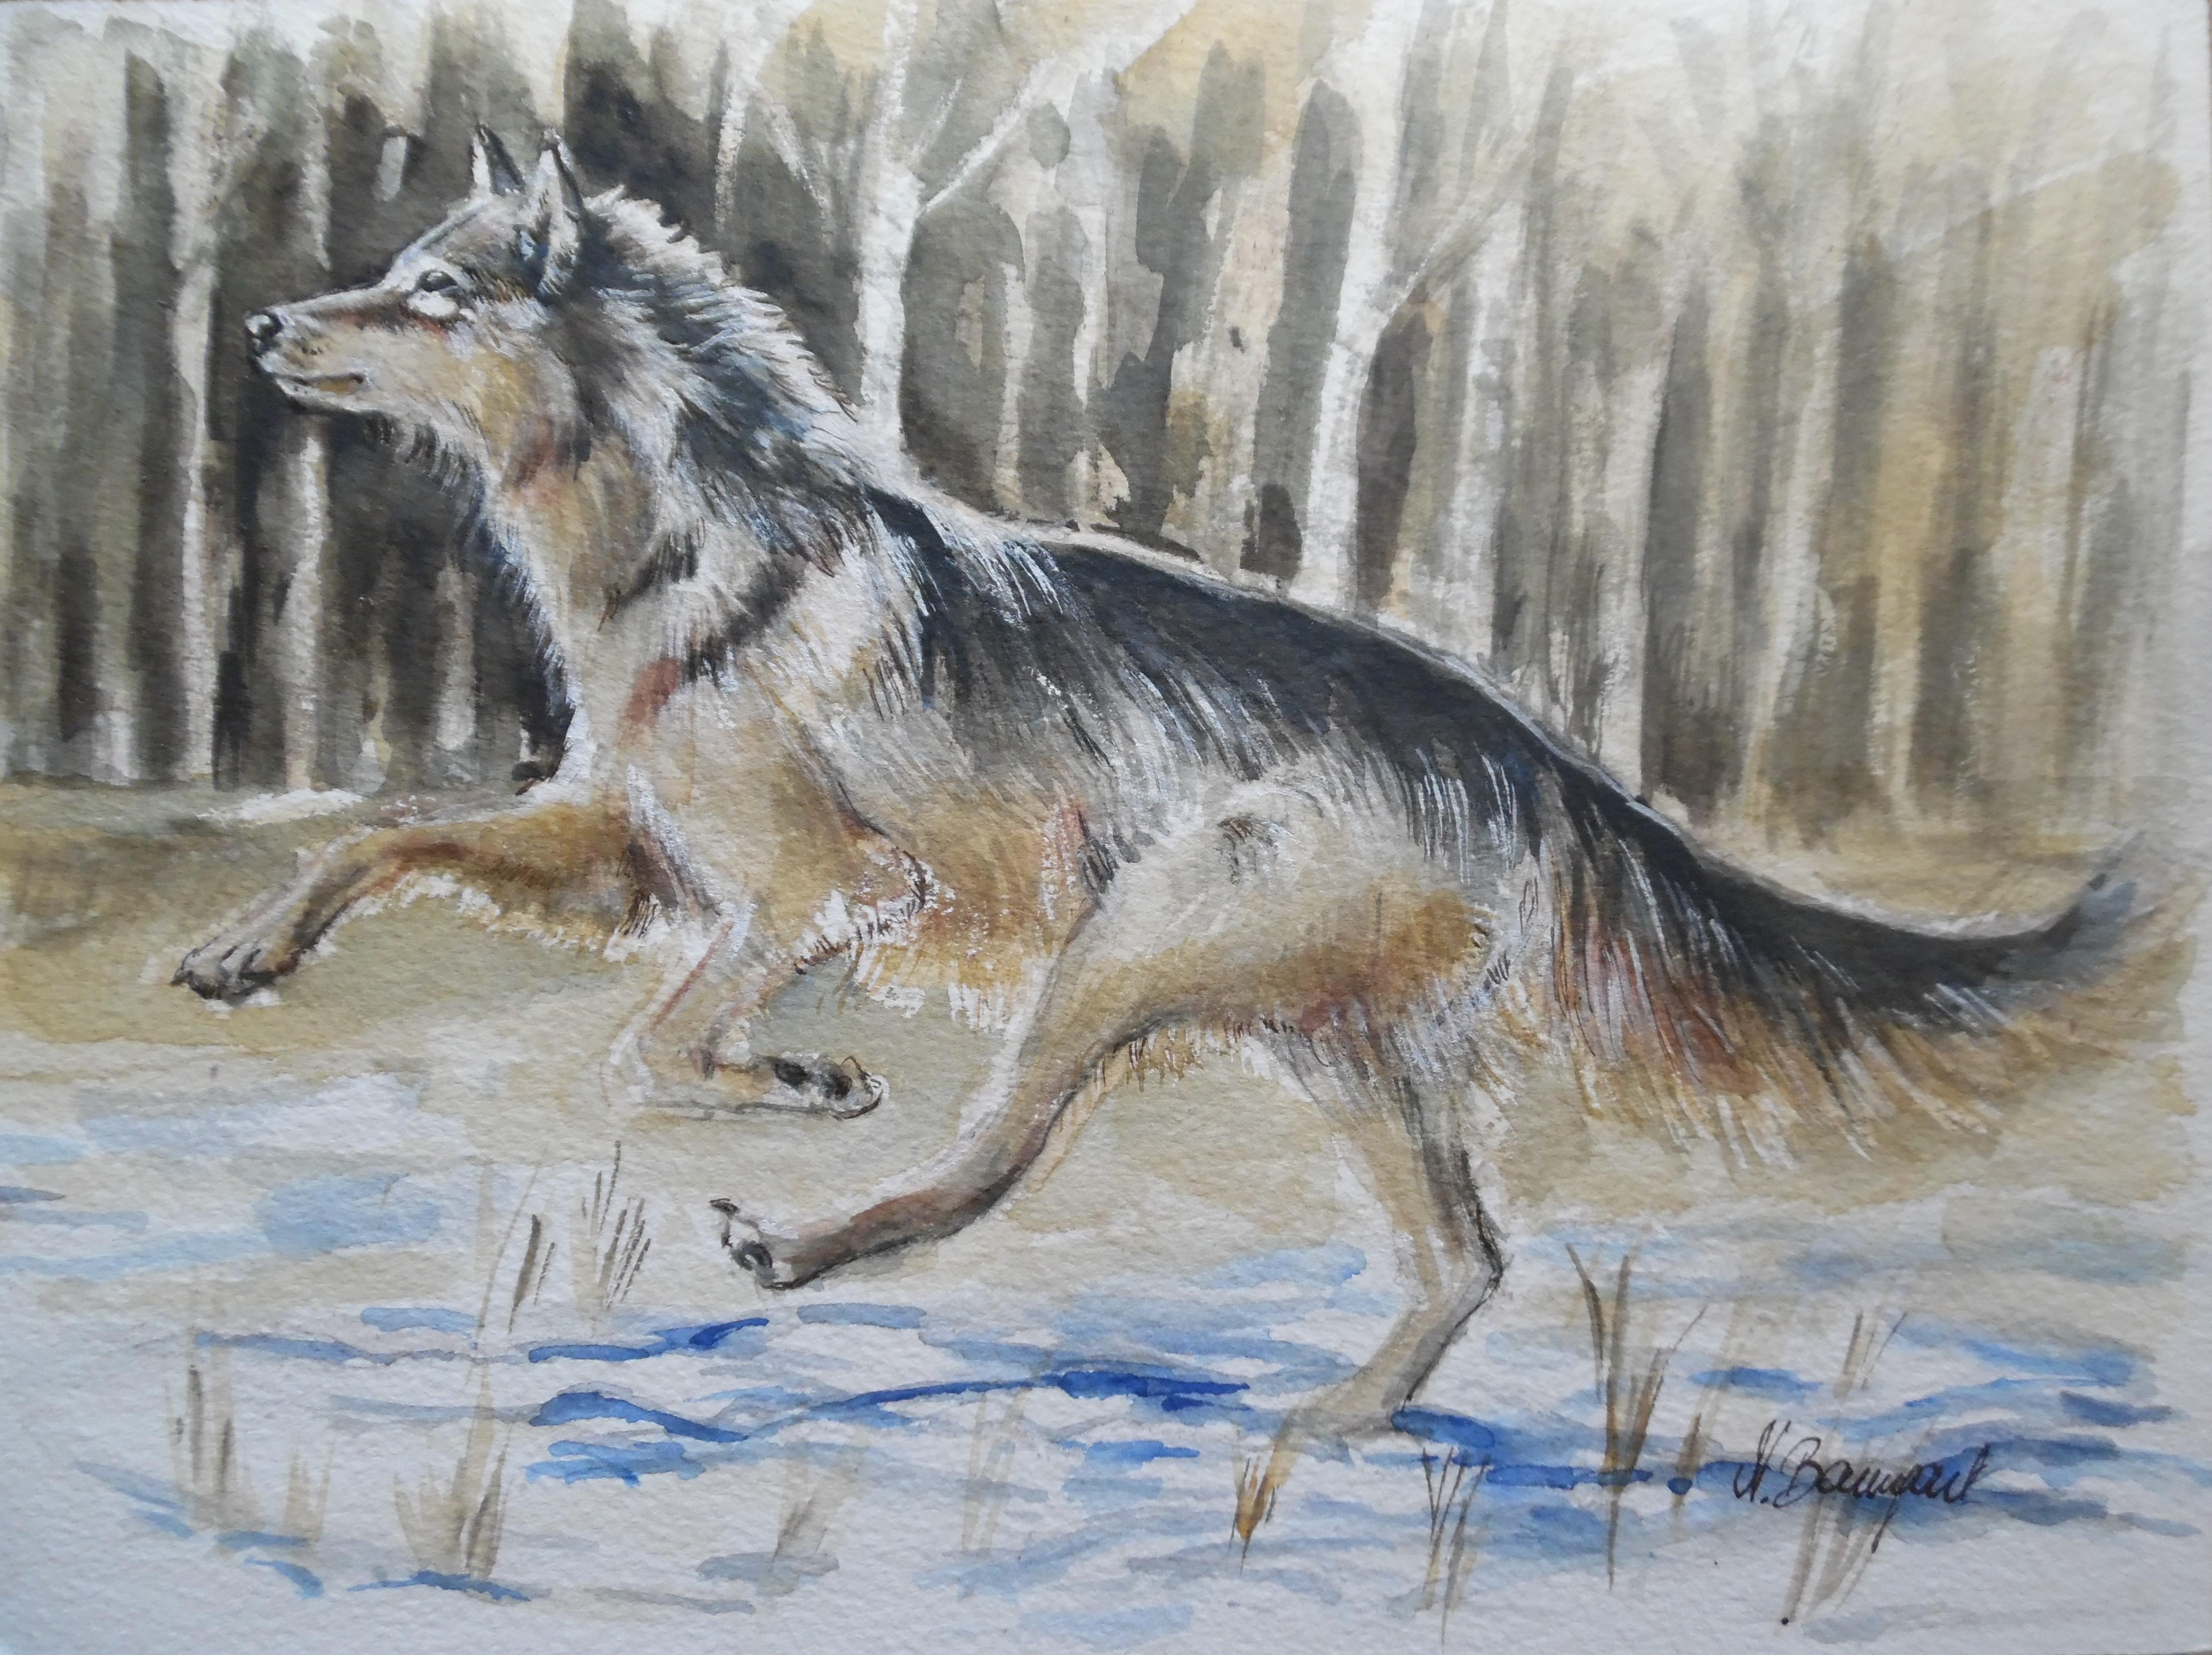 Wolf-Lupo-Auqarell-Watercolour-Nadia-Baumgart